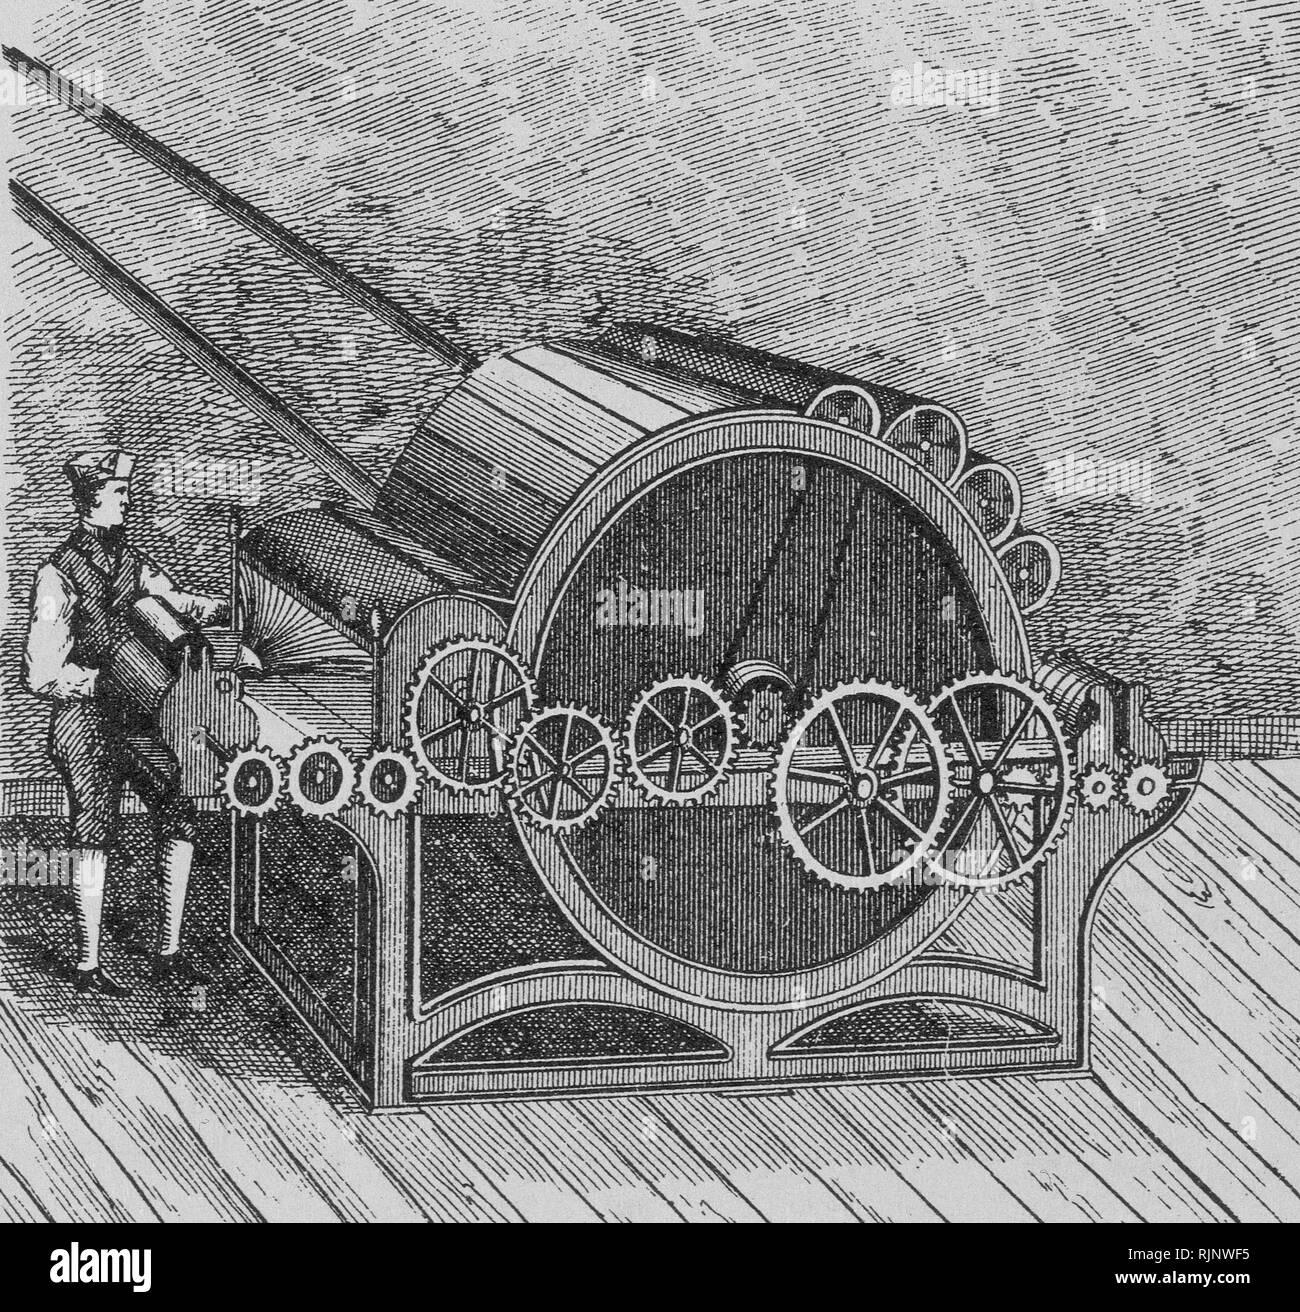 MAQUINA AUTOMATICA DE CARDAR-1773. Author: ARKWRIGHT, RICHARD. - Stock Image